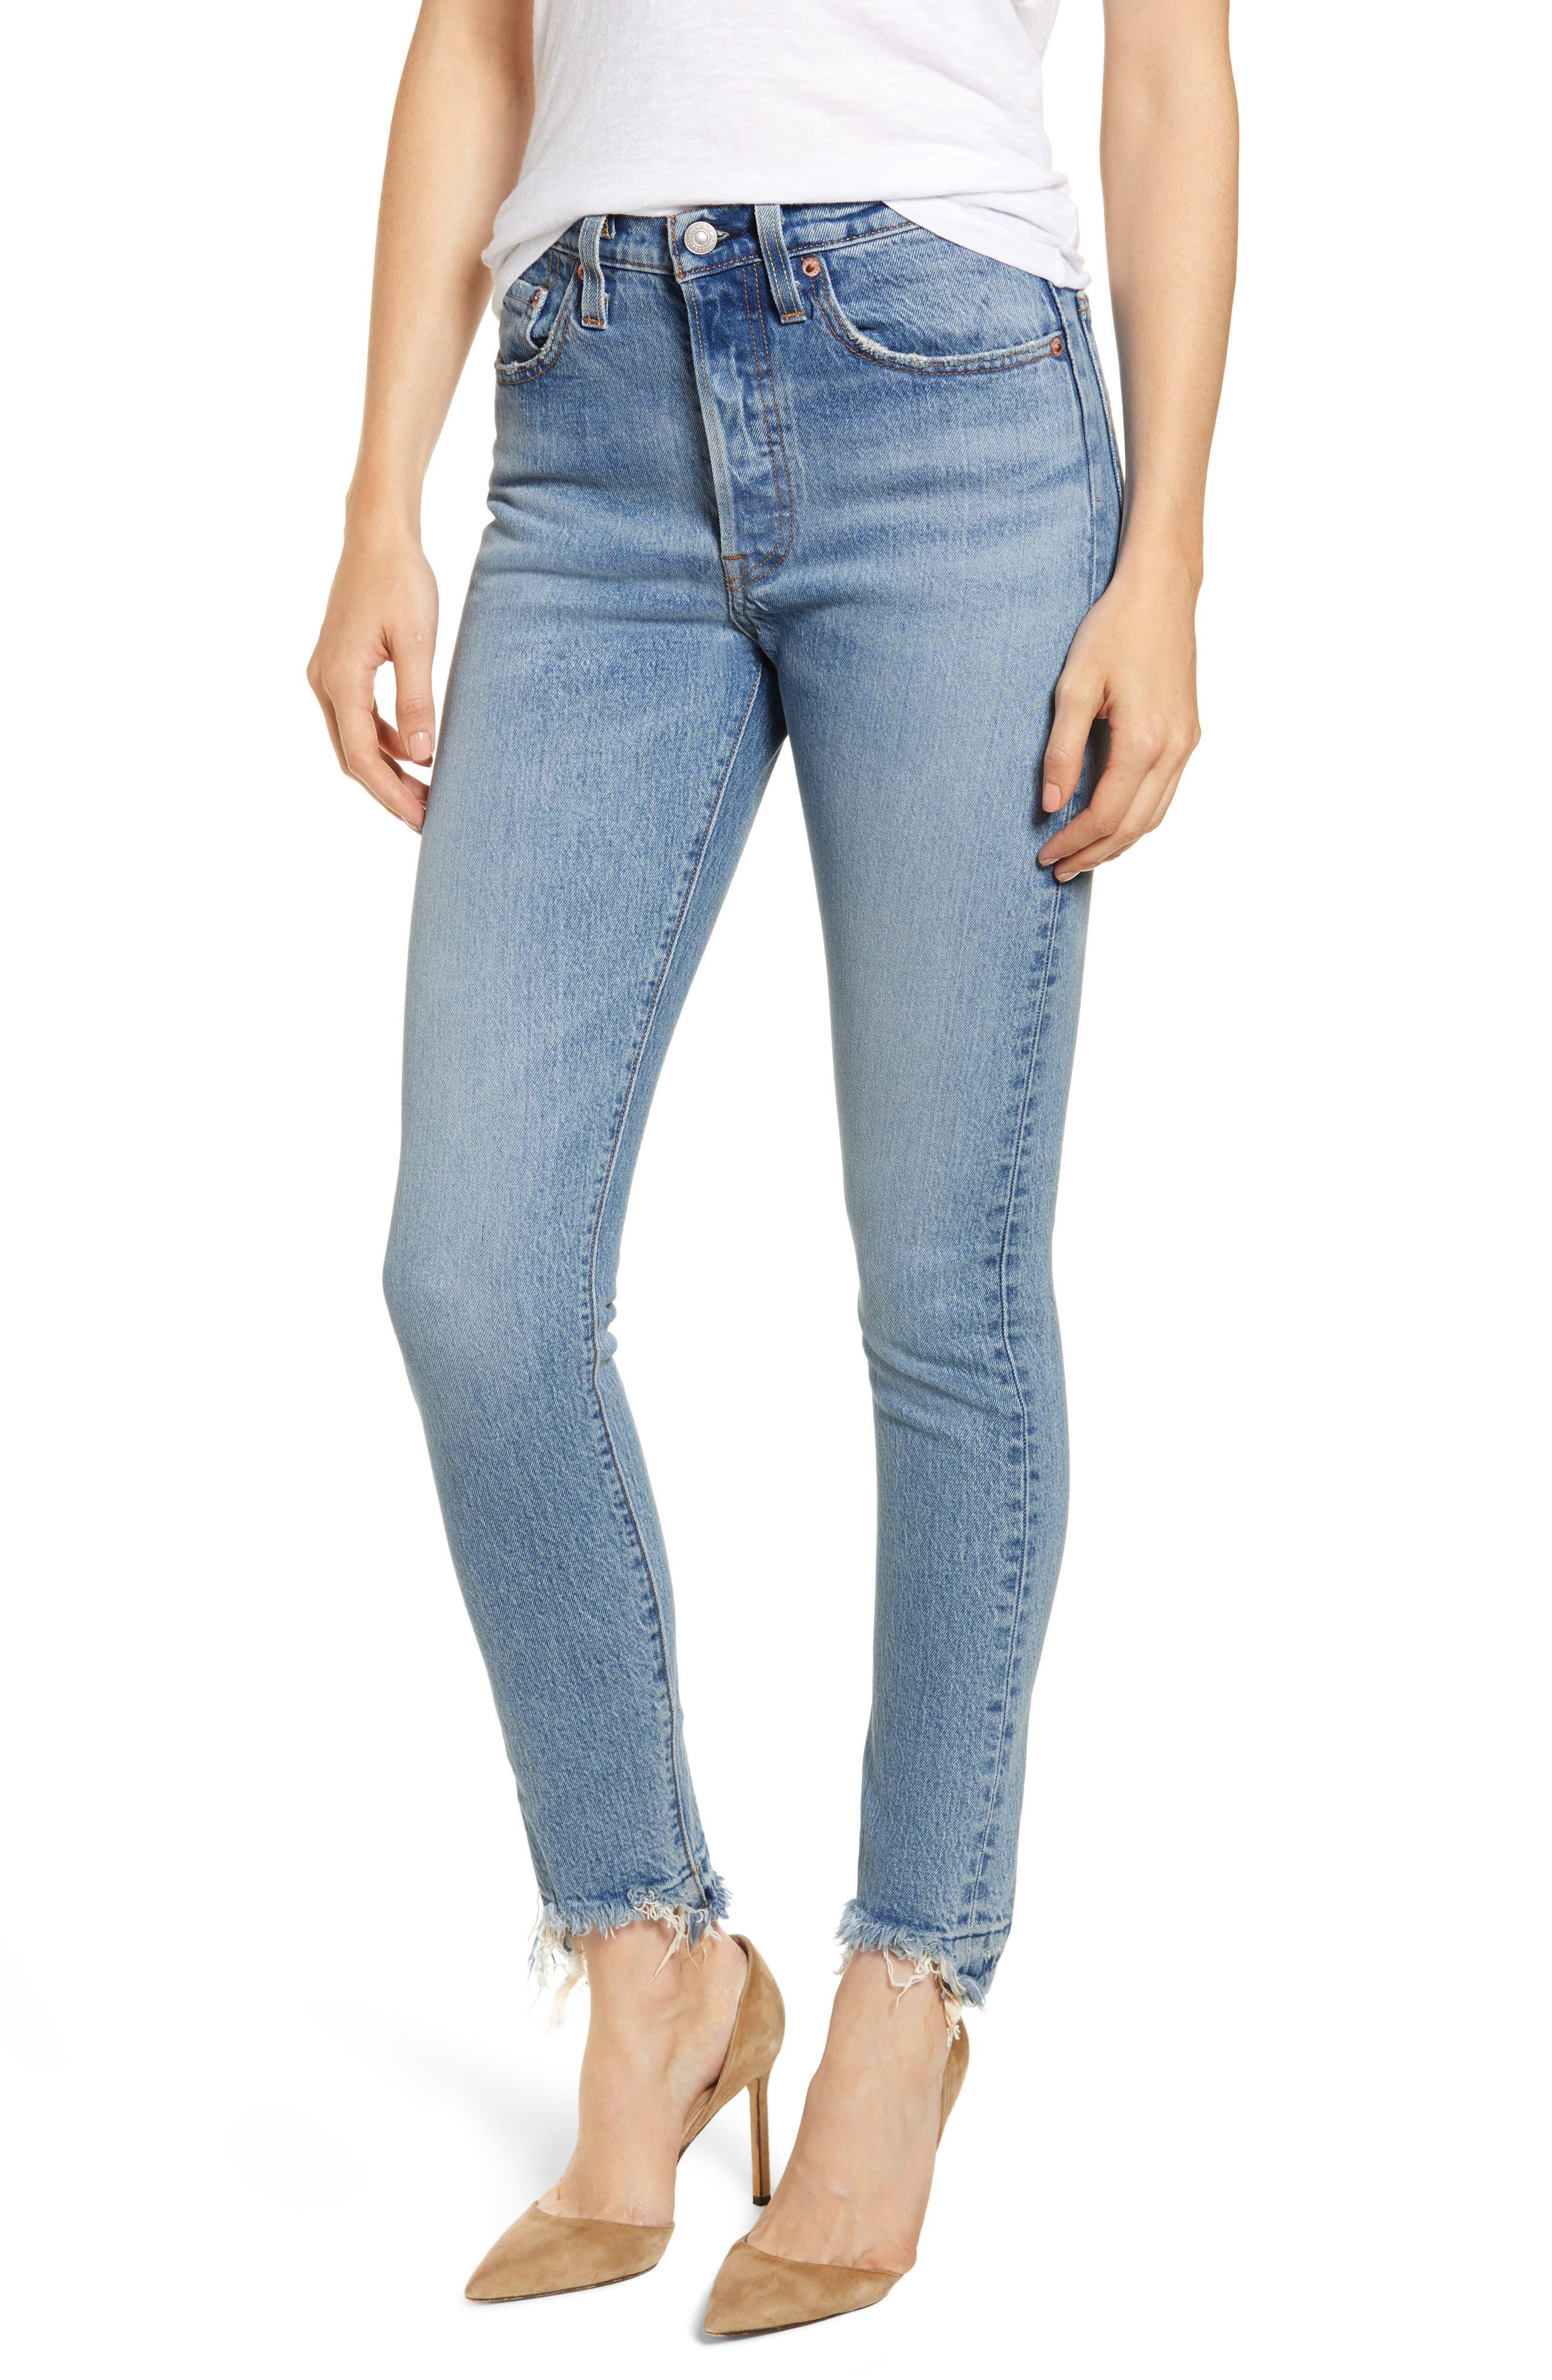 Women's Levi's 501 High Waist Nibbled Hem Skinny Jeans,  28 x 28 - Blue